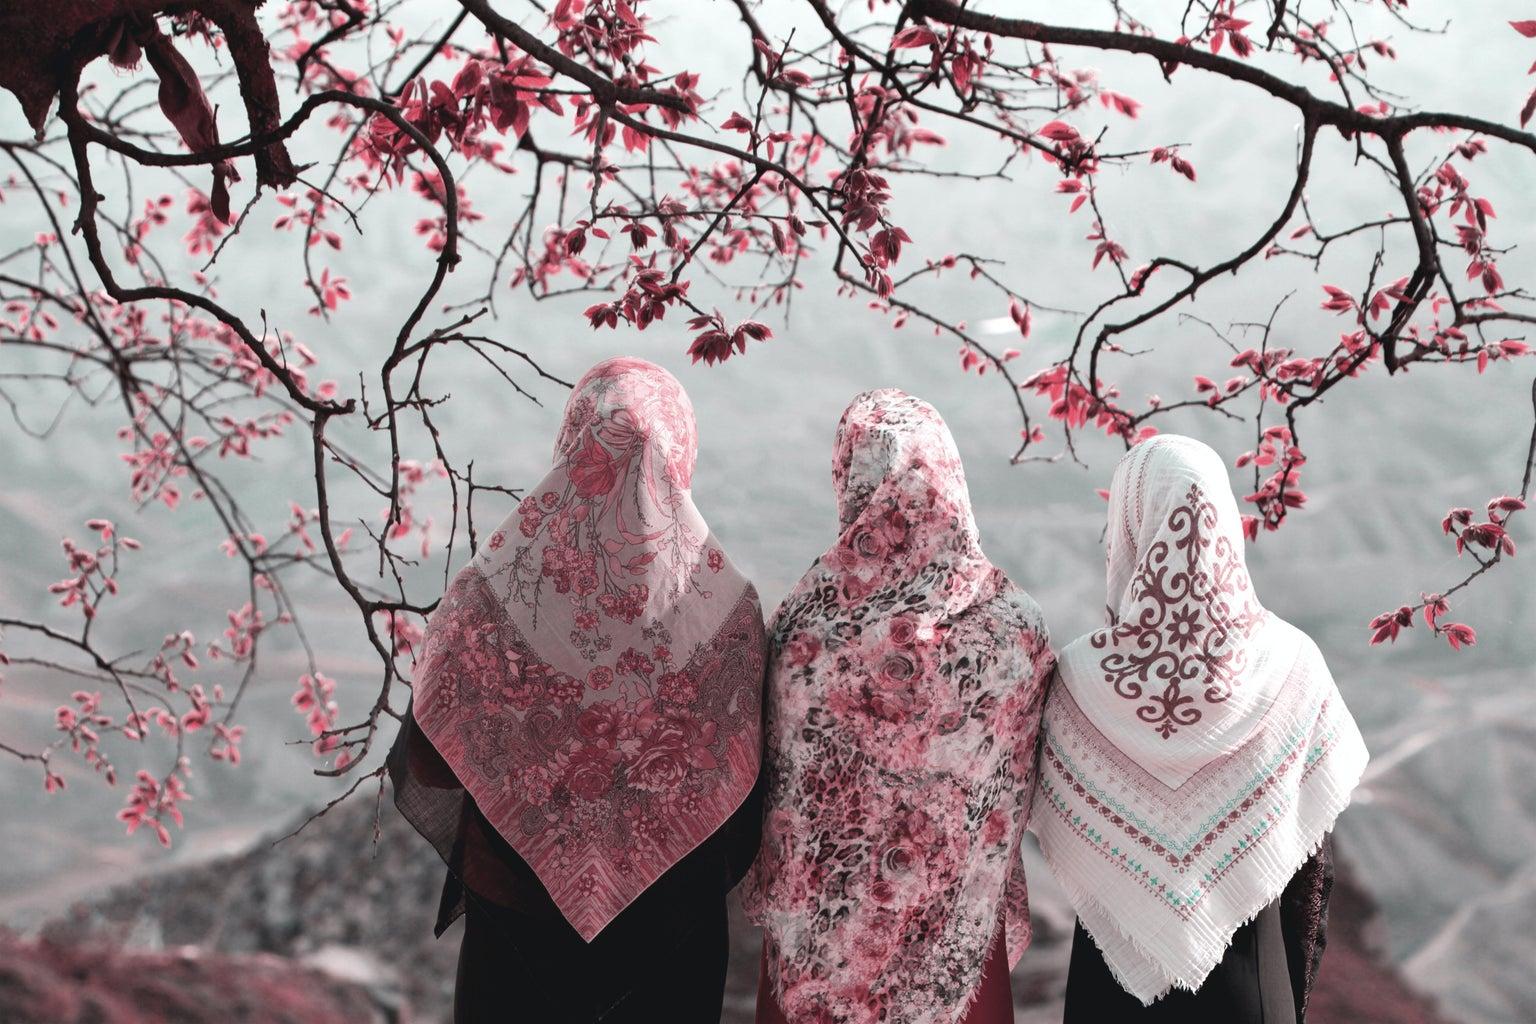 Three muslim women under a cherry blossom tree